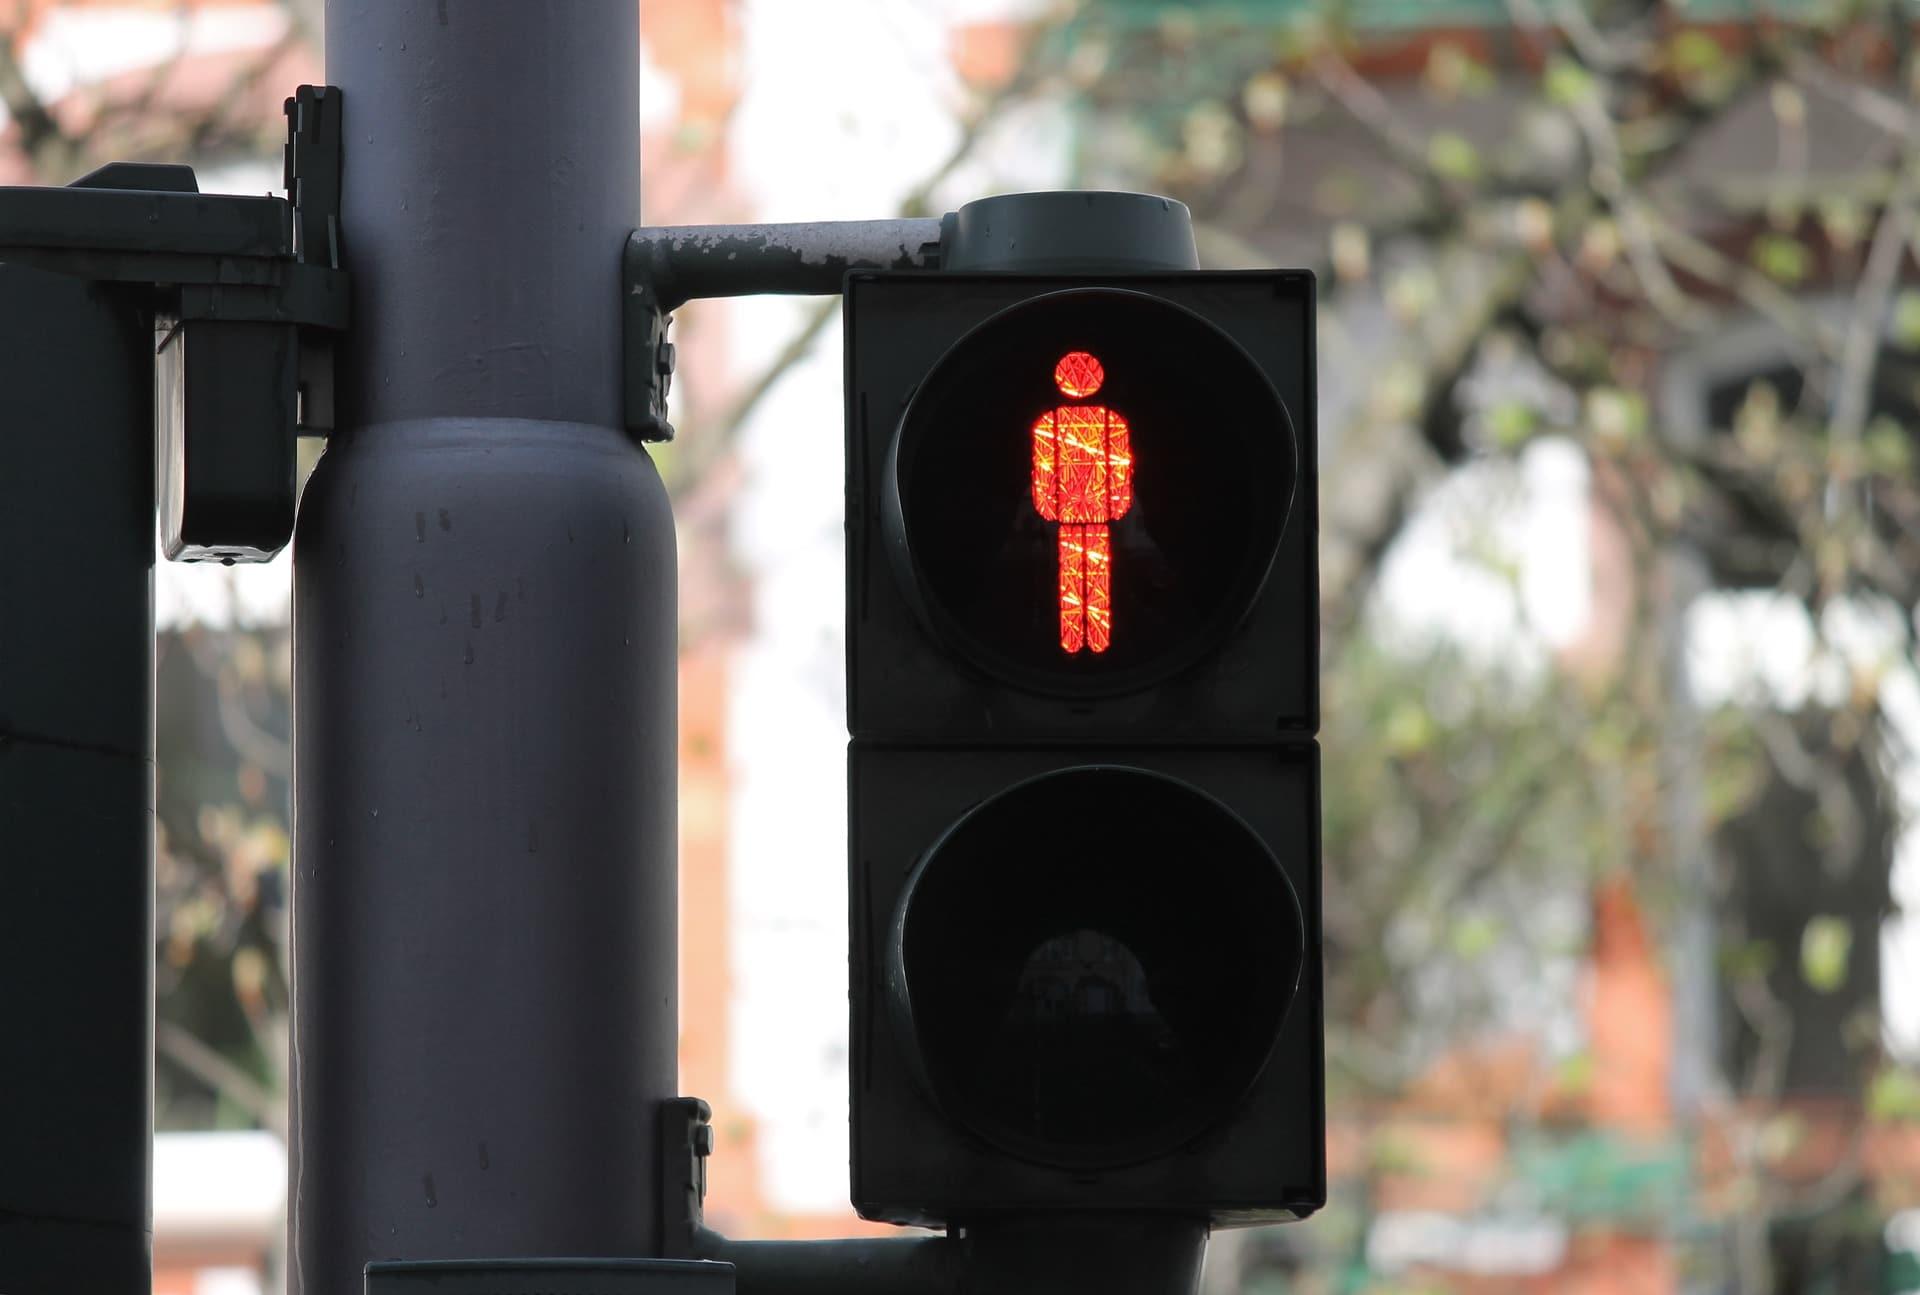 Echec à l'examen de code de la route : la solution